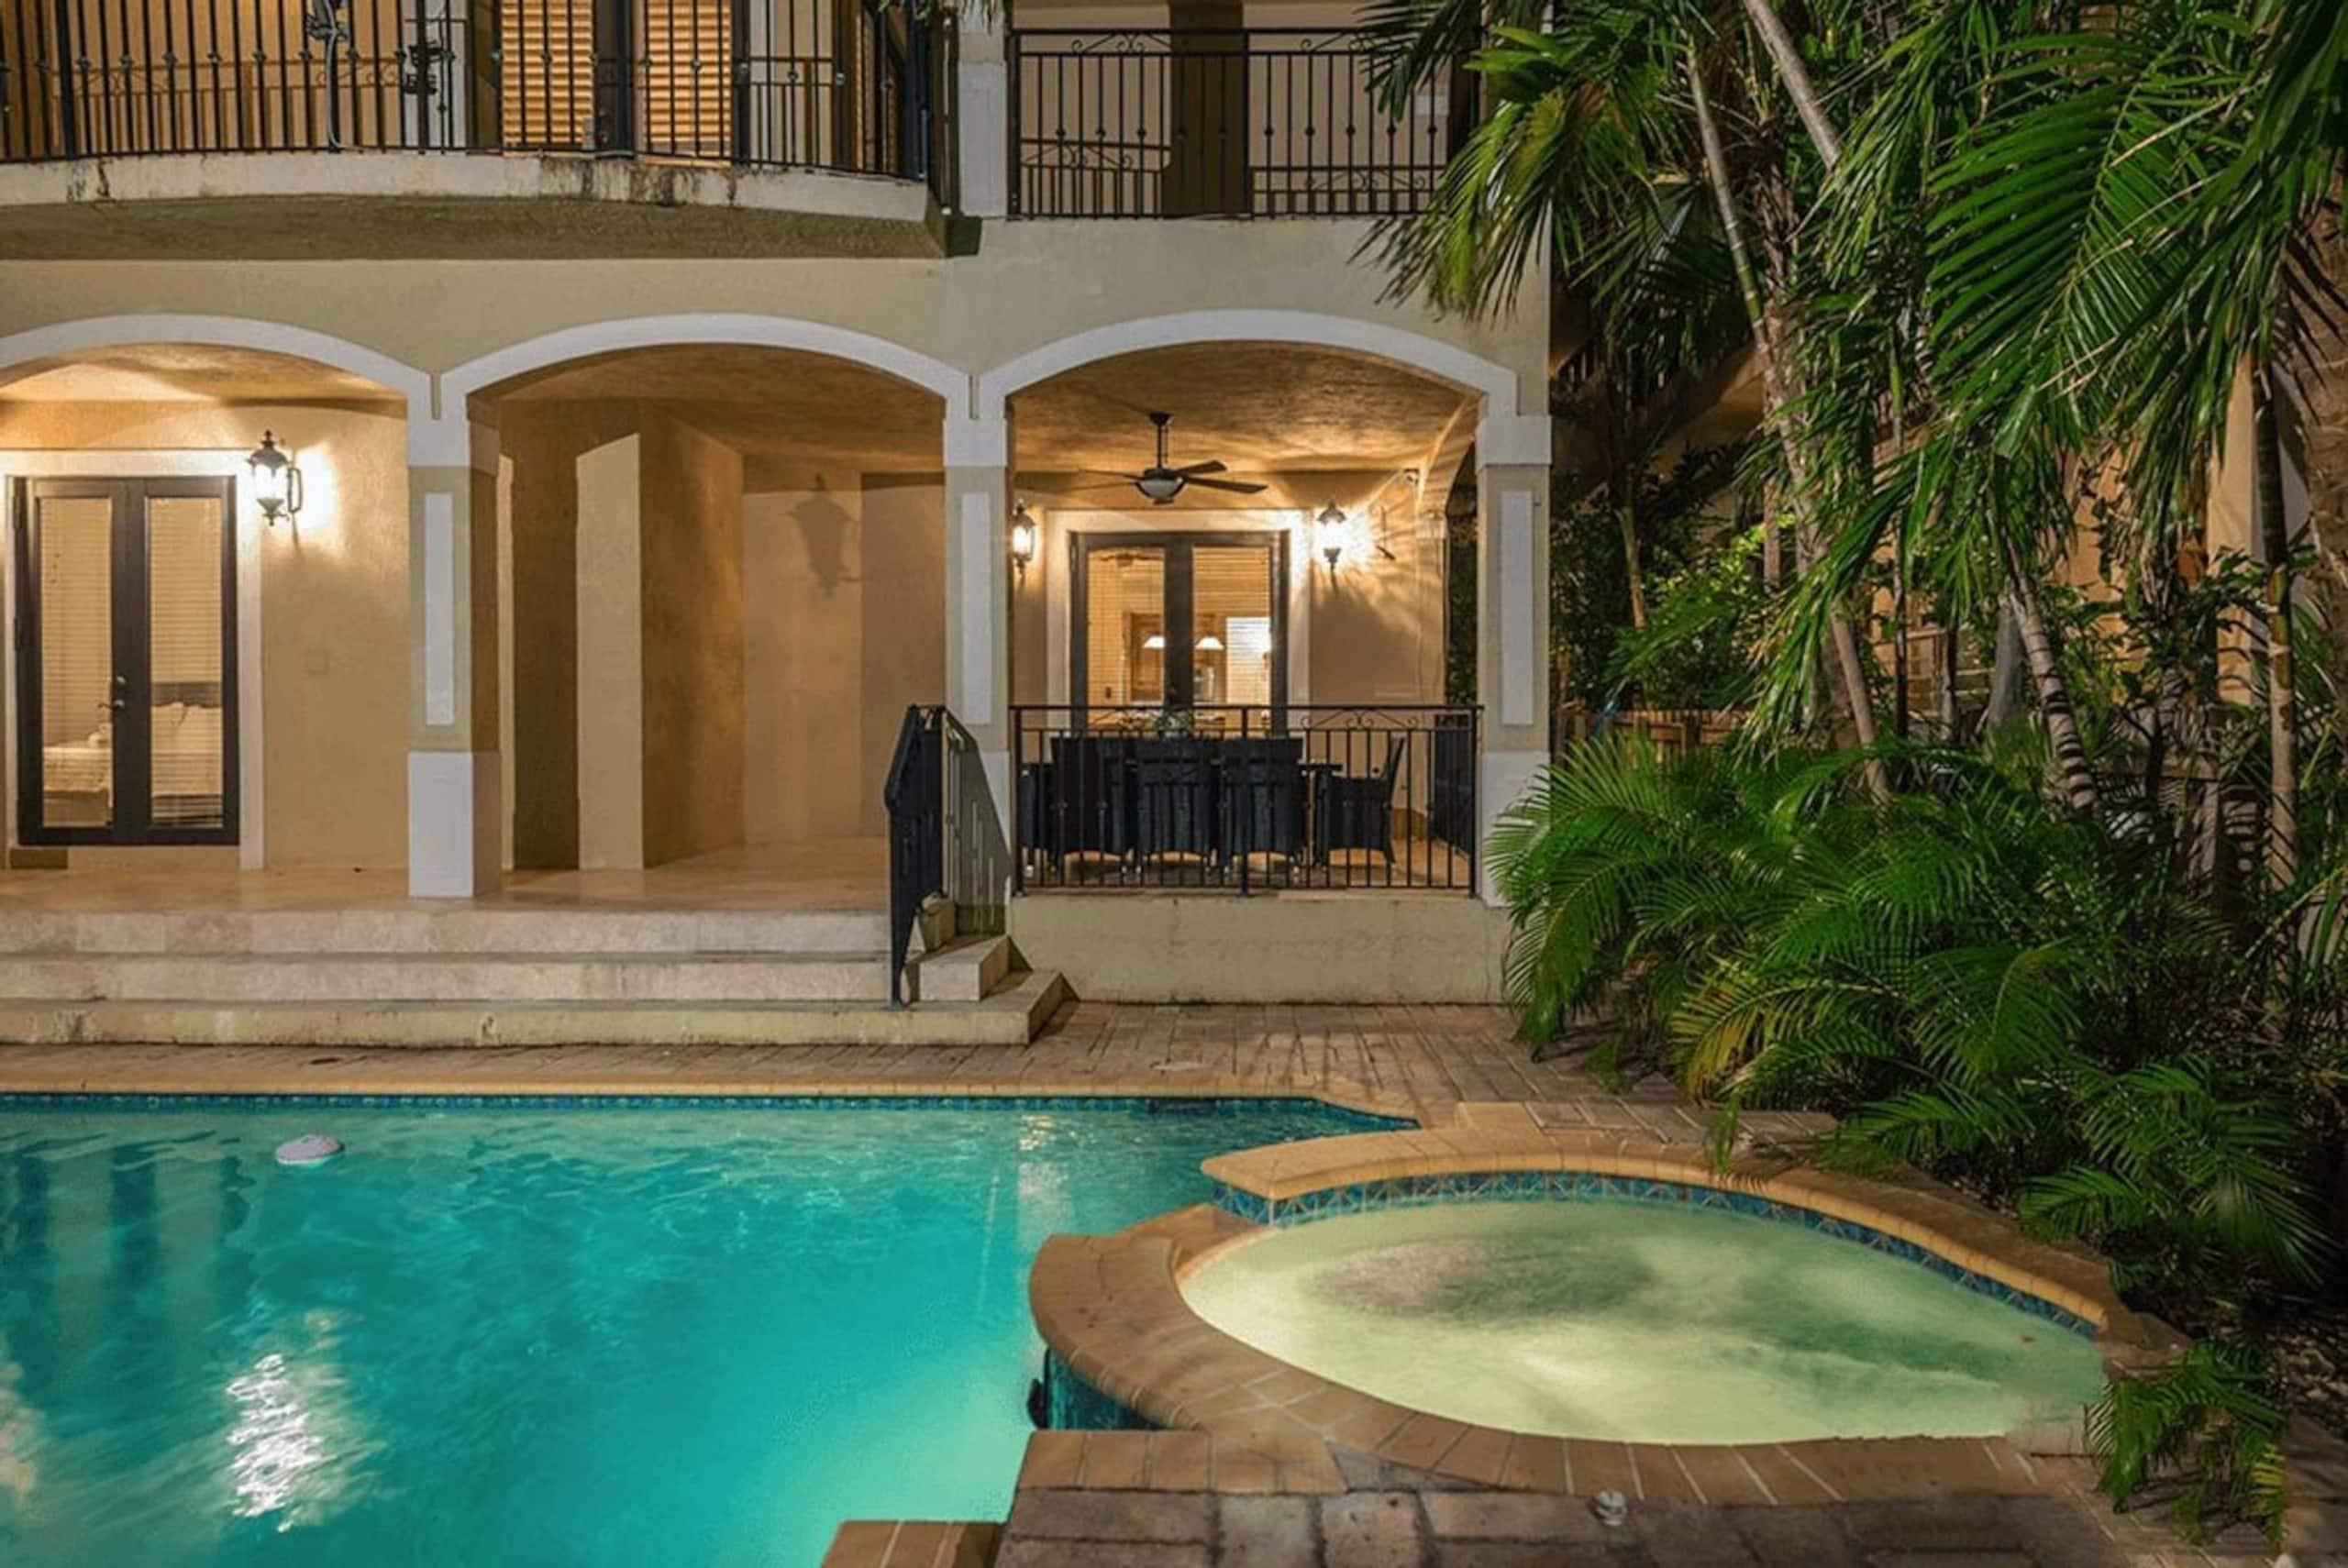 Apartment Villa Lawrence - Luxury Villa photo 22682494